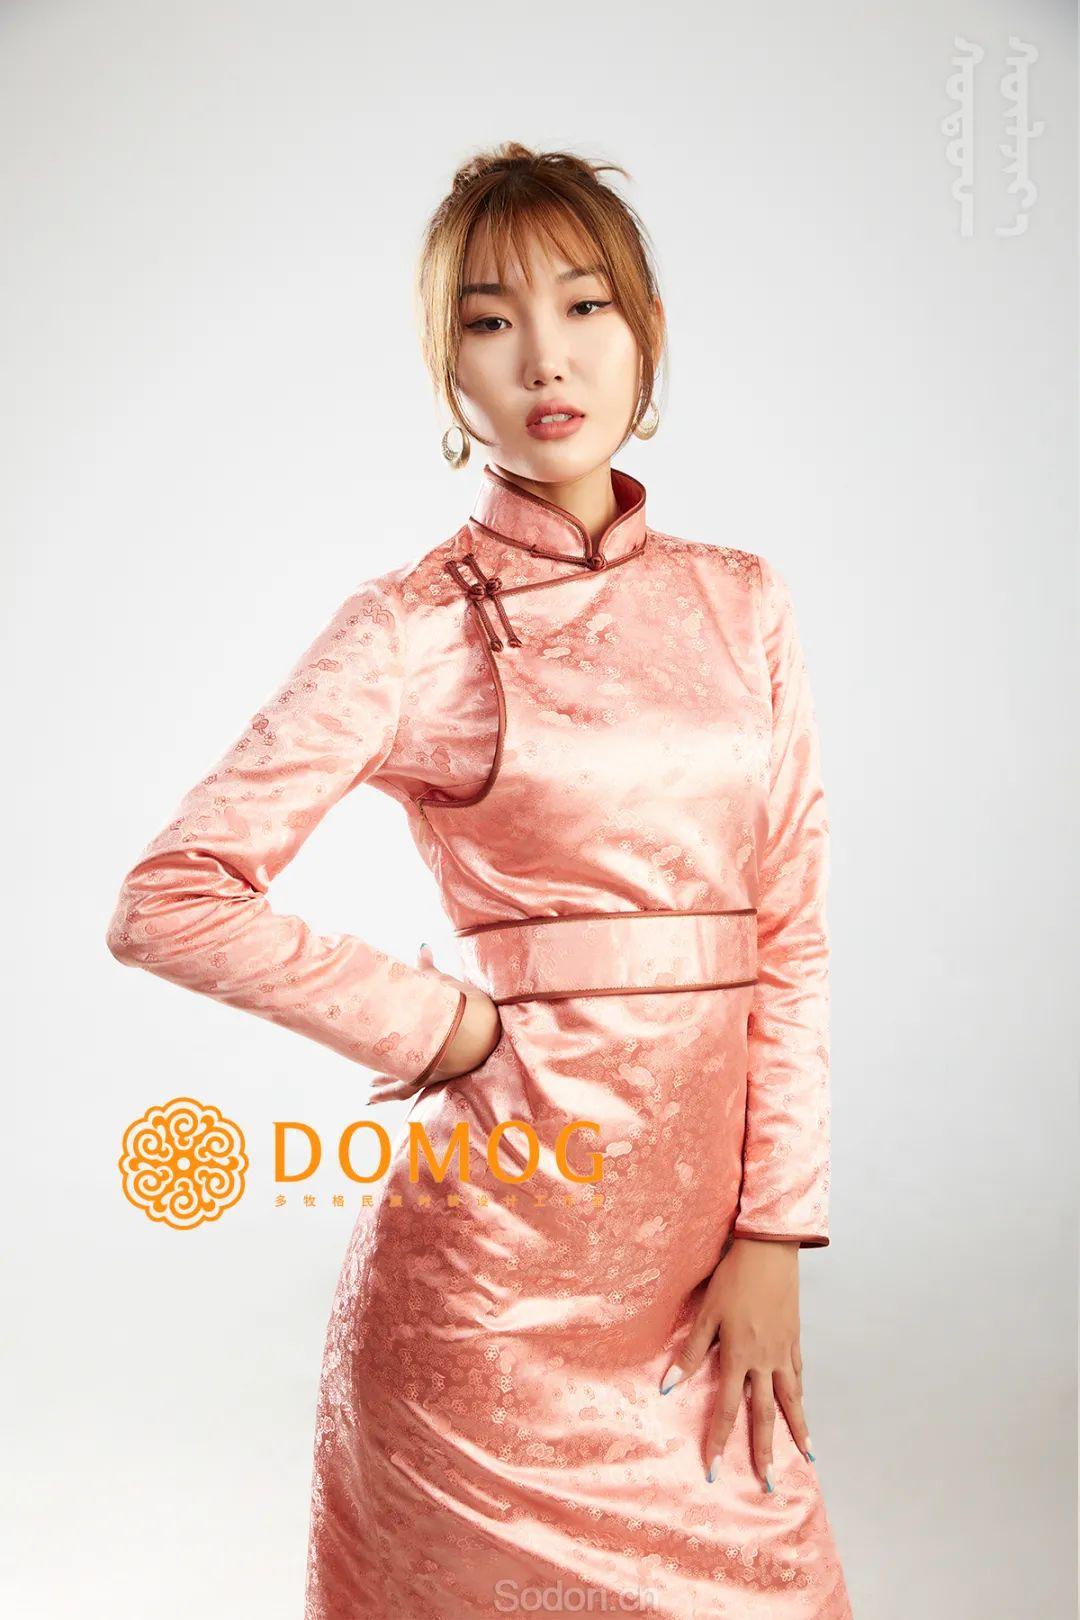 DOMOG 蒙古时装2020新款,民族与时尚的融合 第20张 DOMOG 蒙古时装2020新款,民族与时尚的融合 蒙古服饰